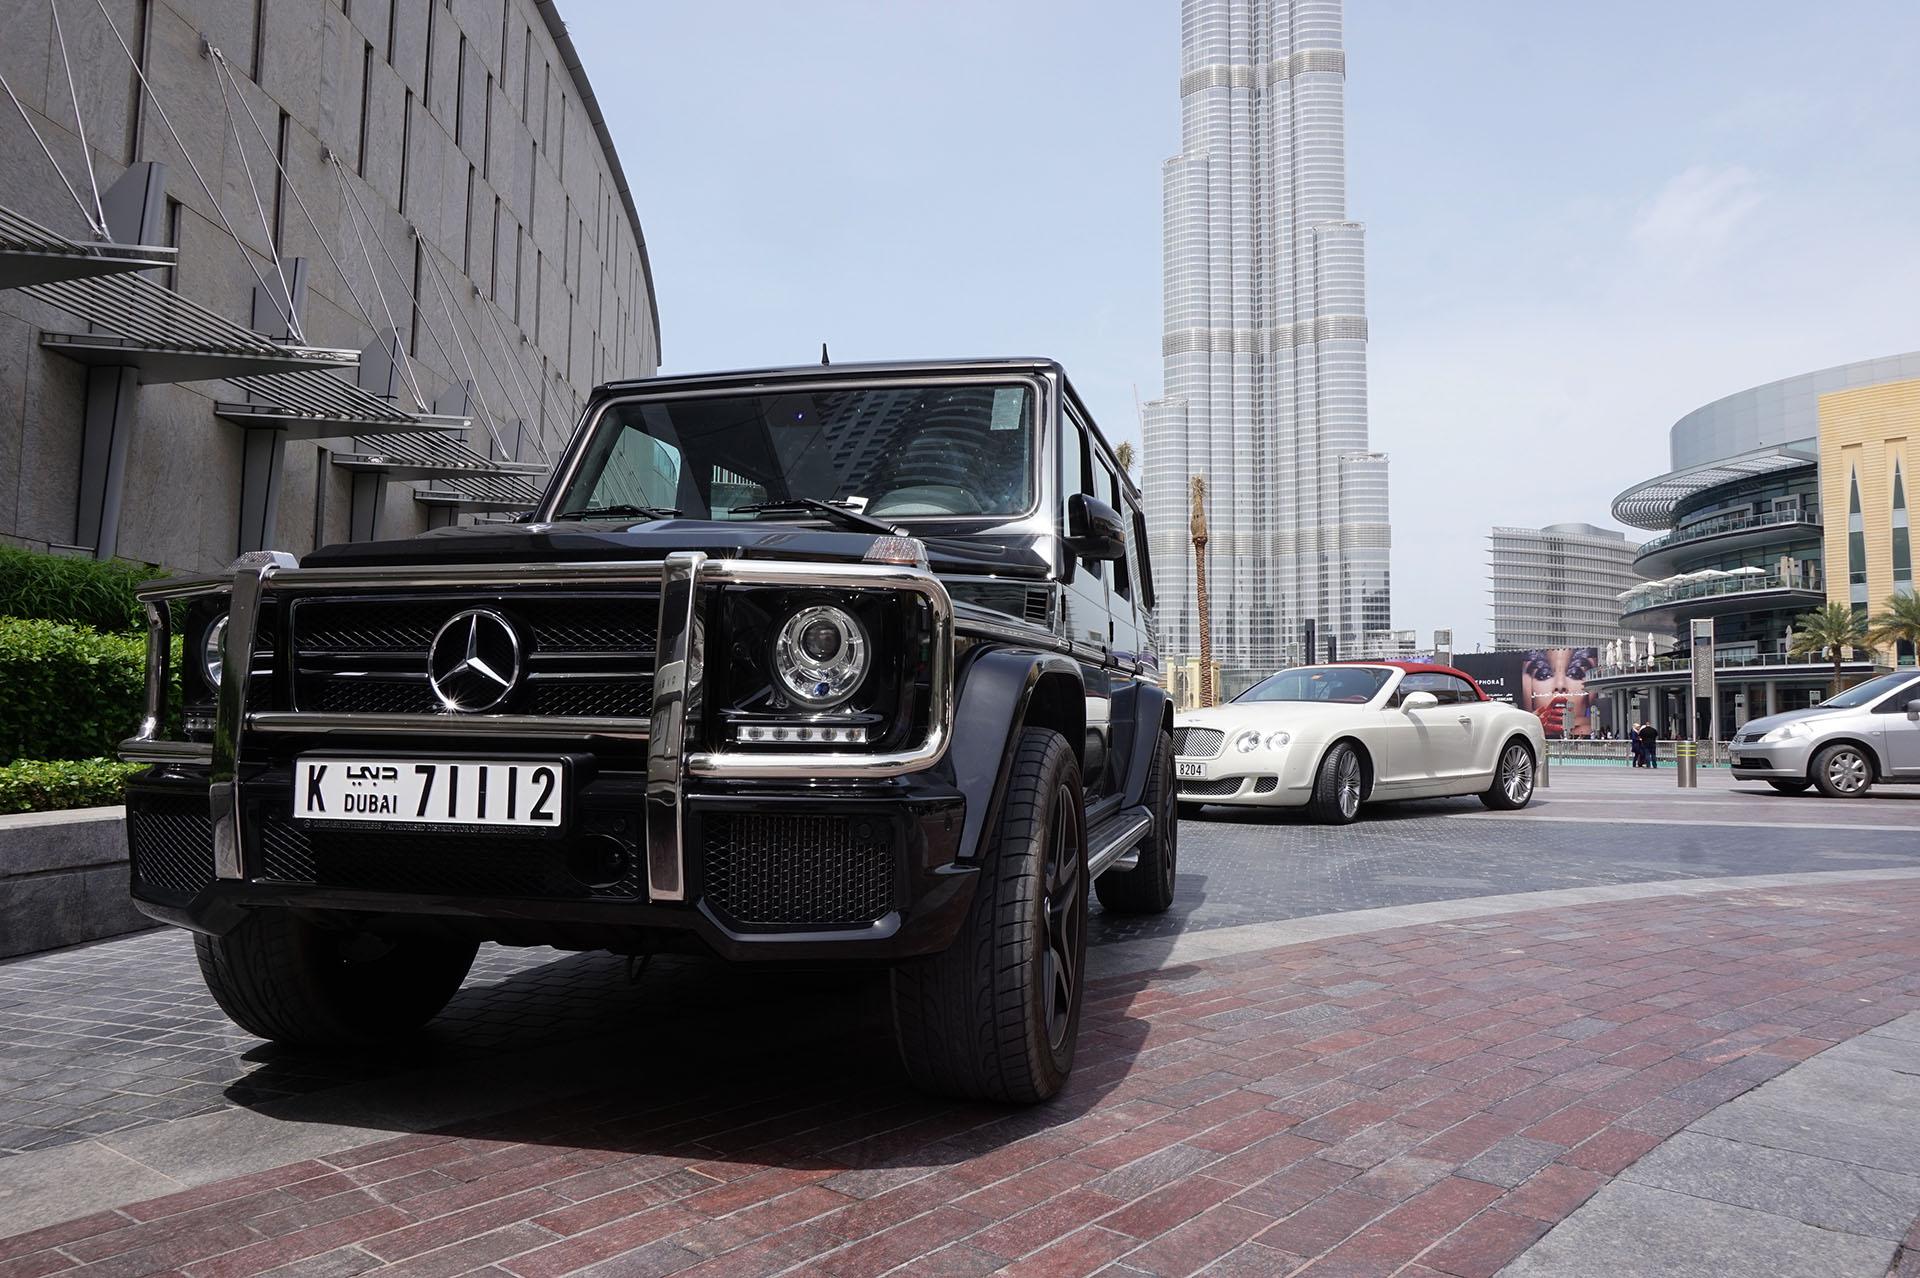 Dubai G merci